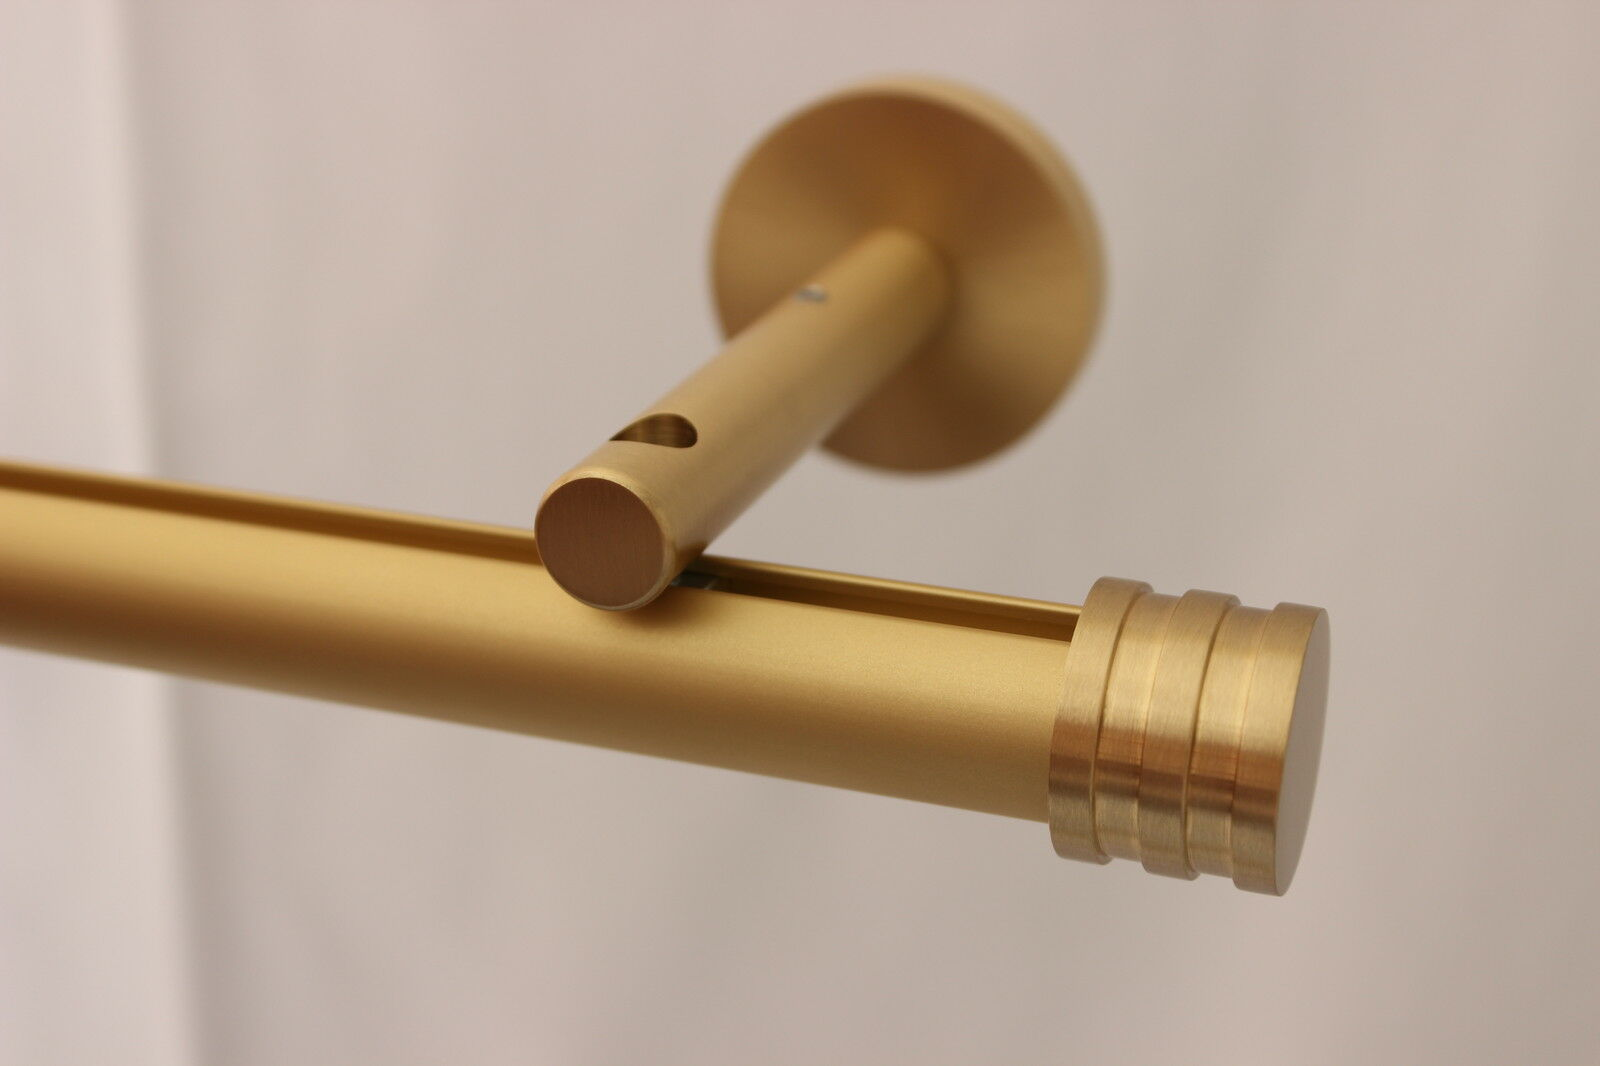 GARDINEUM 20 mm Gardinenstange 8 cm Träger messing matt m. Endkappe Dehli Profil  | Modisch